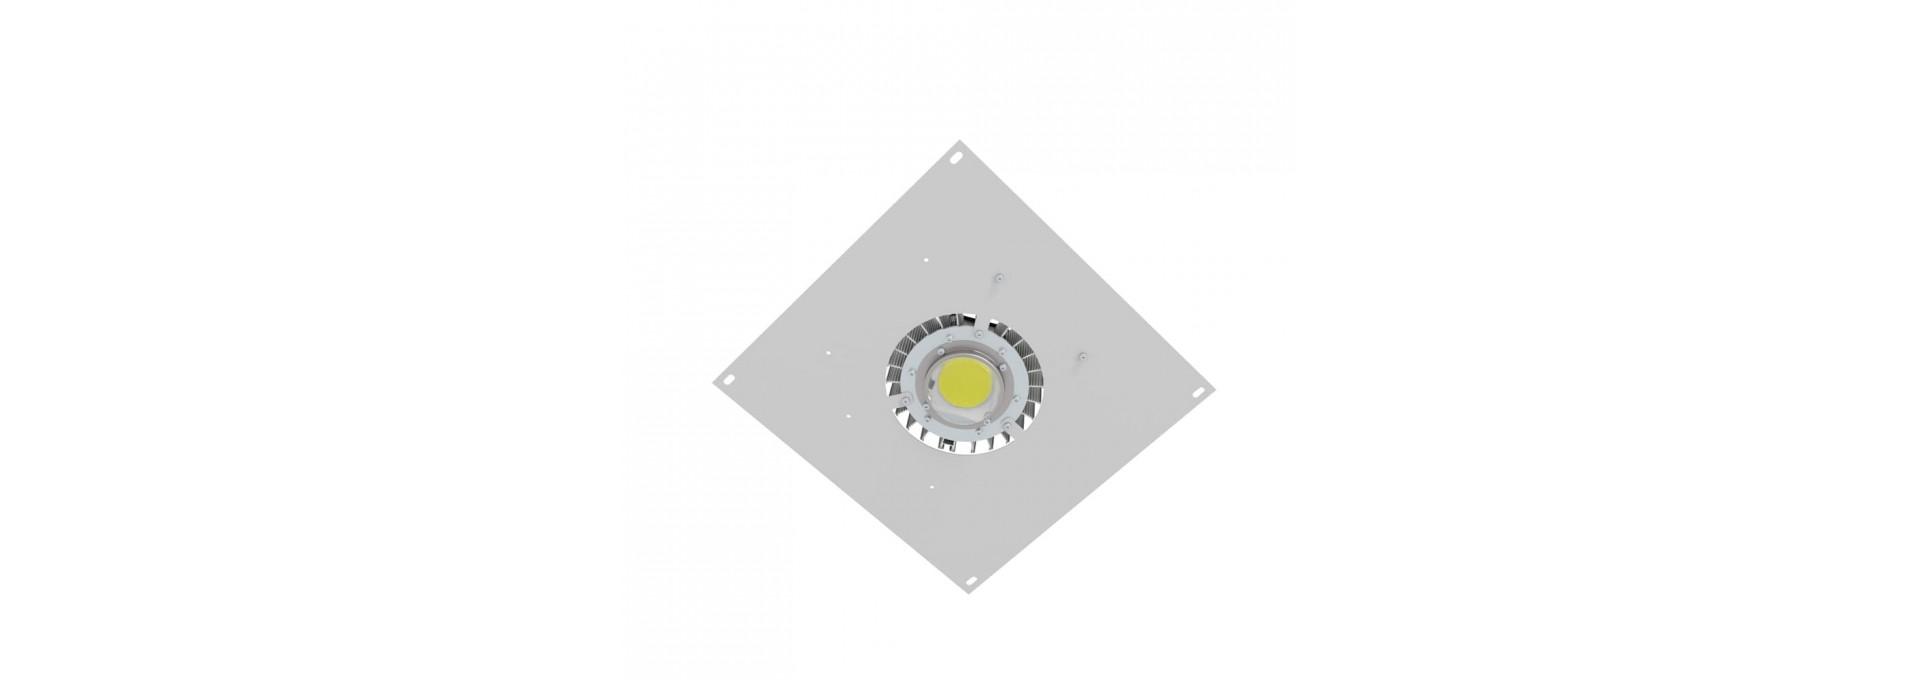 АЗС 50 Эко 4500К 45°